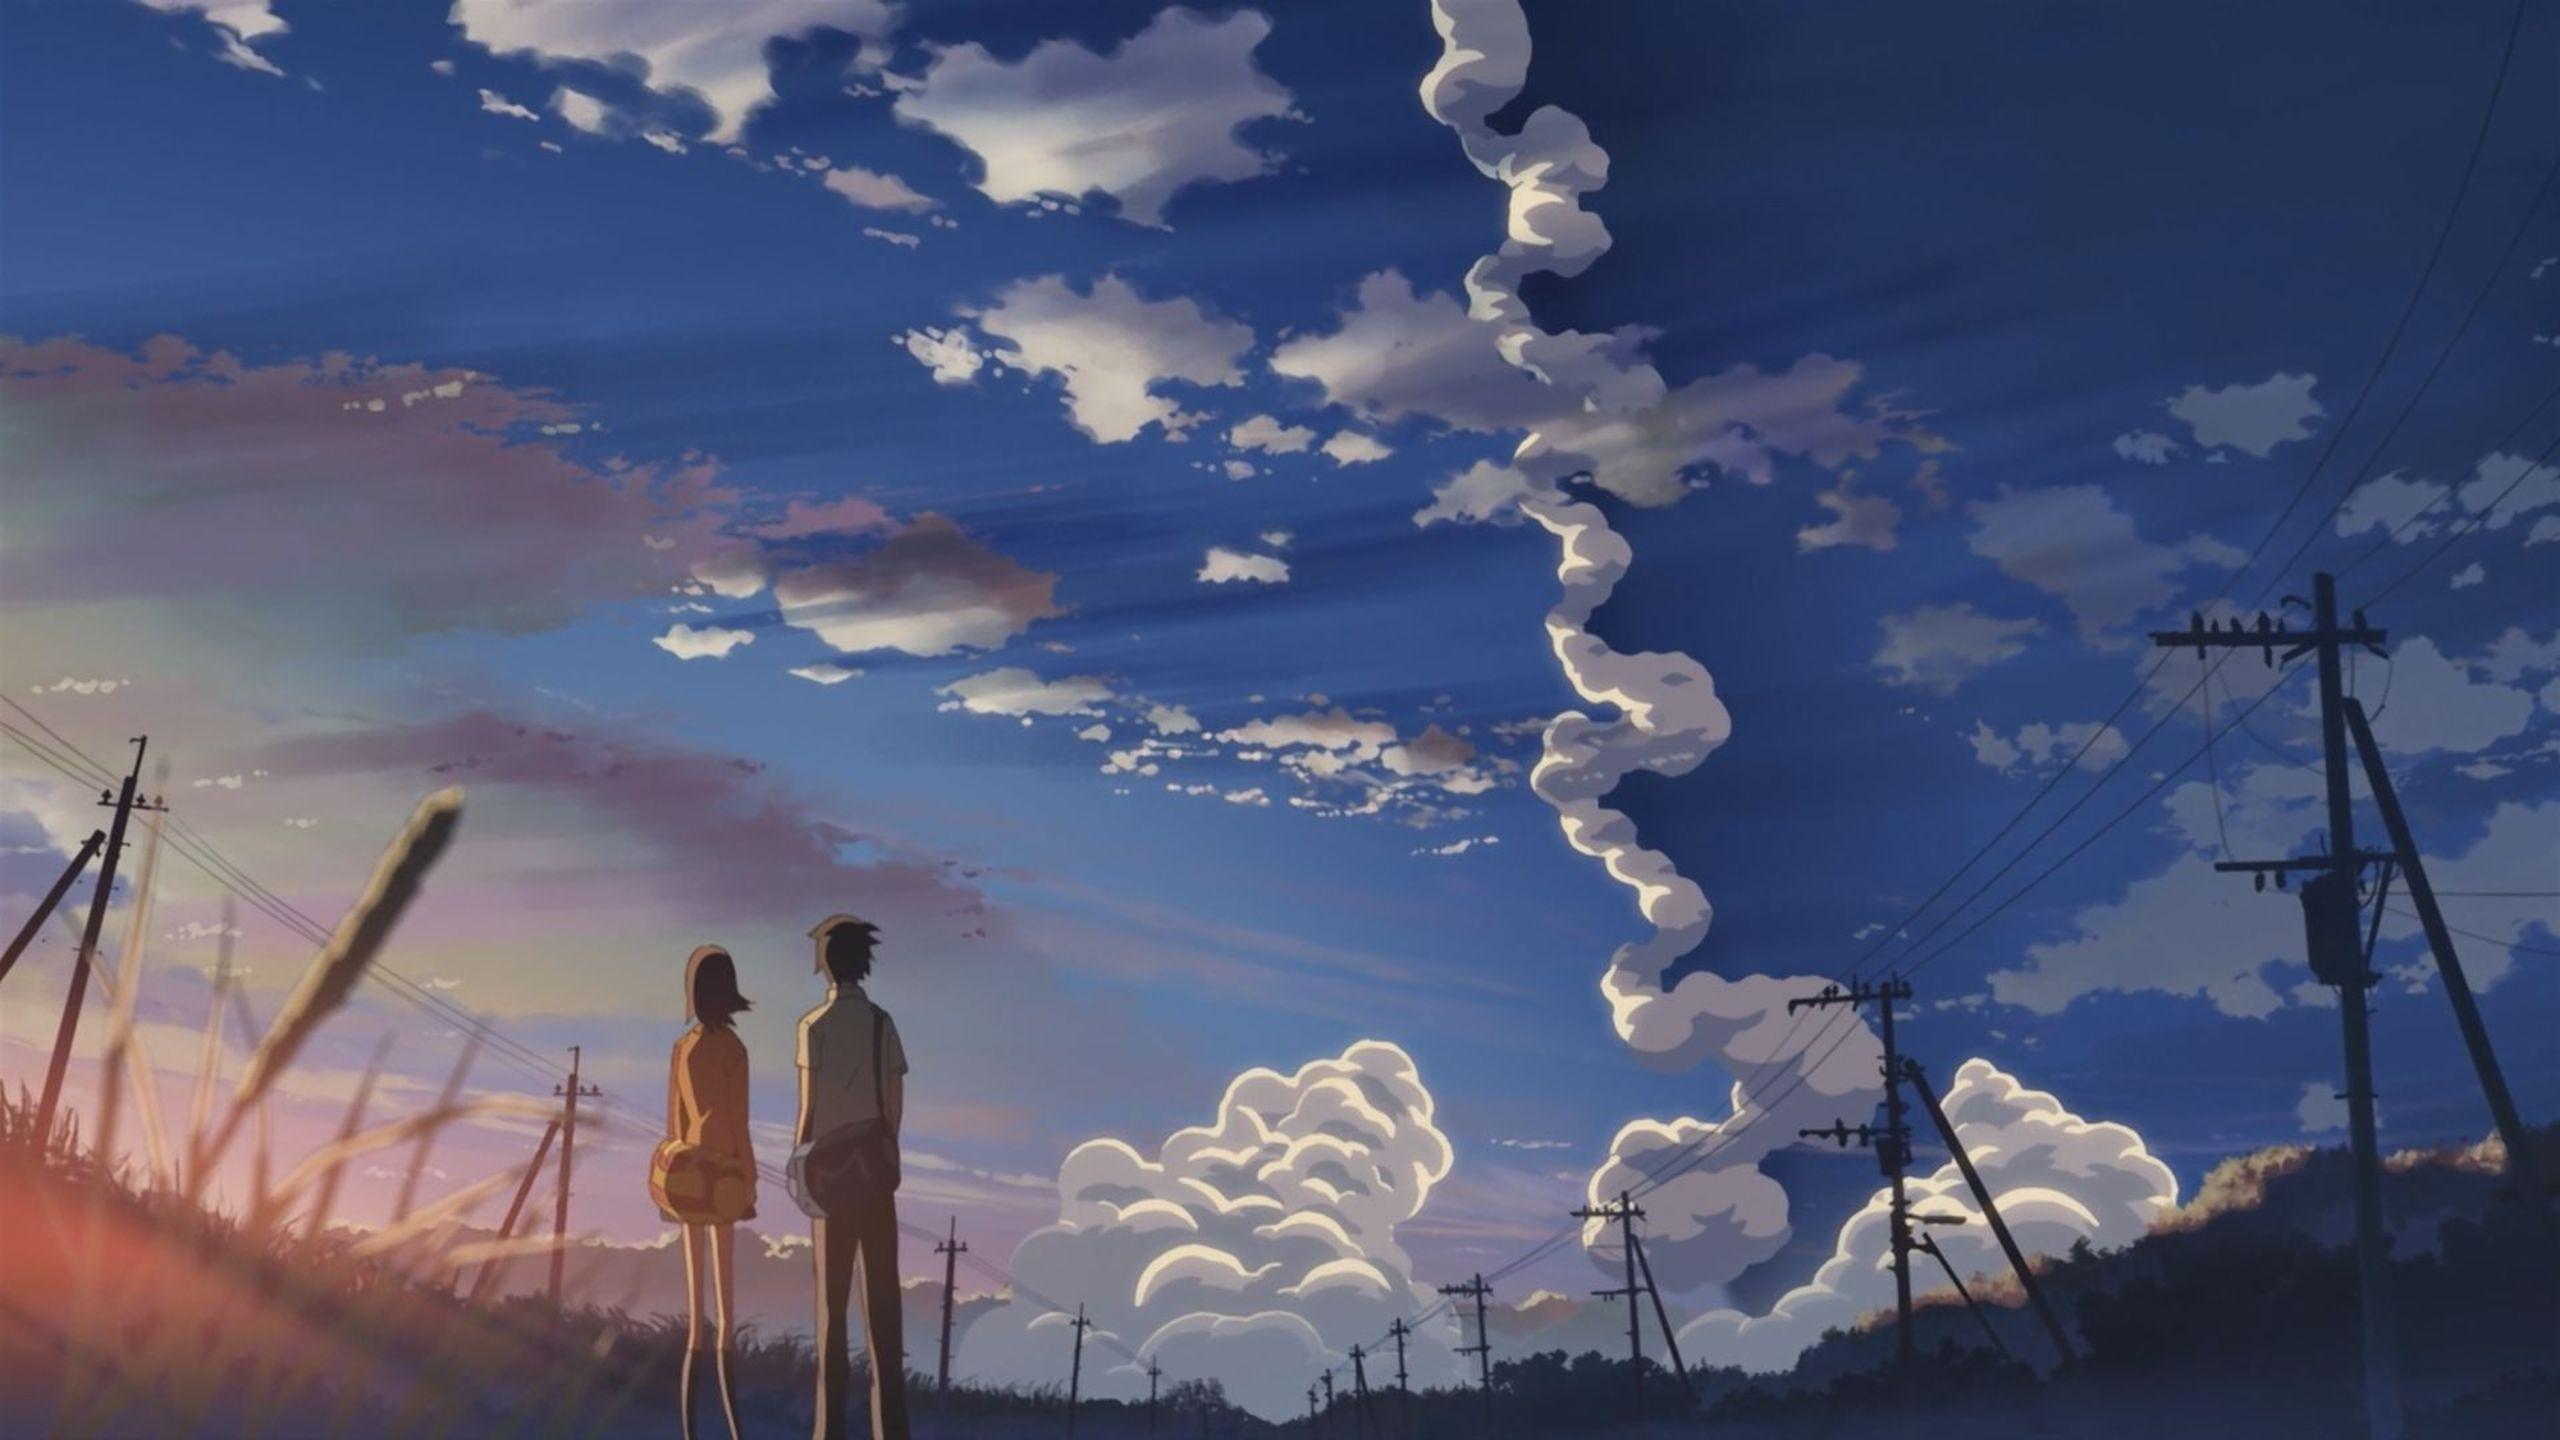 5 Centimeters Per Second Wallpaper Anime Scenery Chill Mix Anime